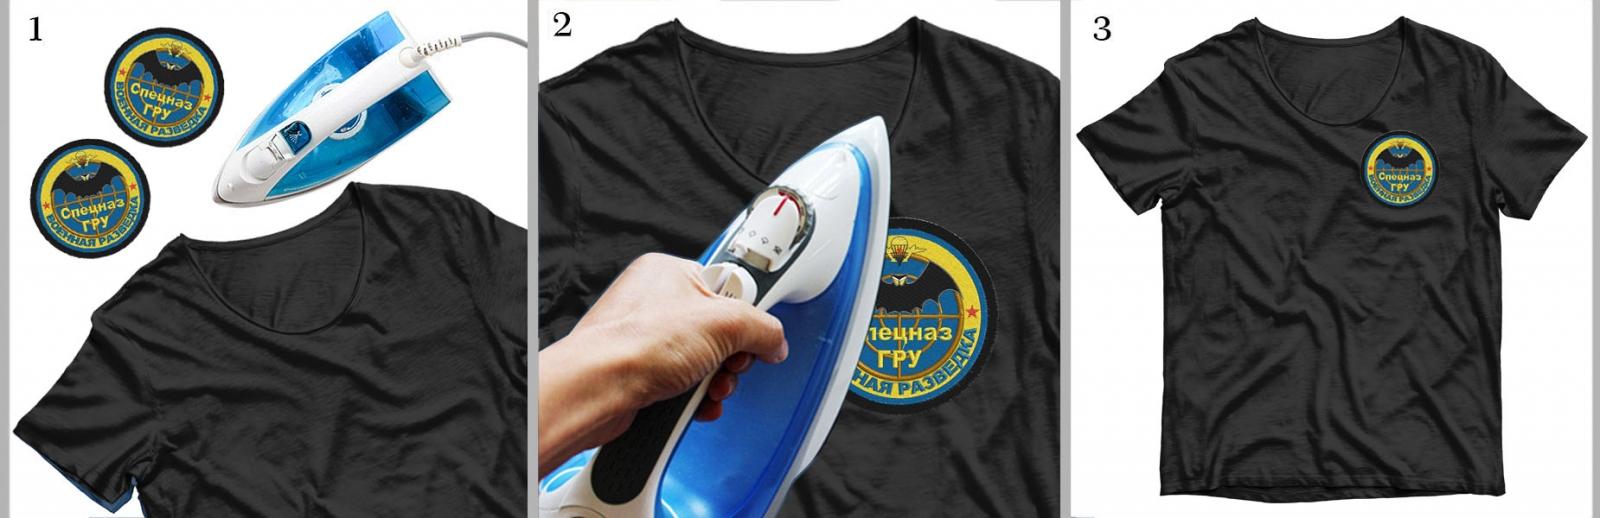 Шеврон Спецназа ГРУ на футболке